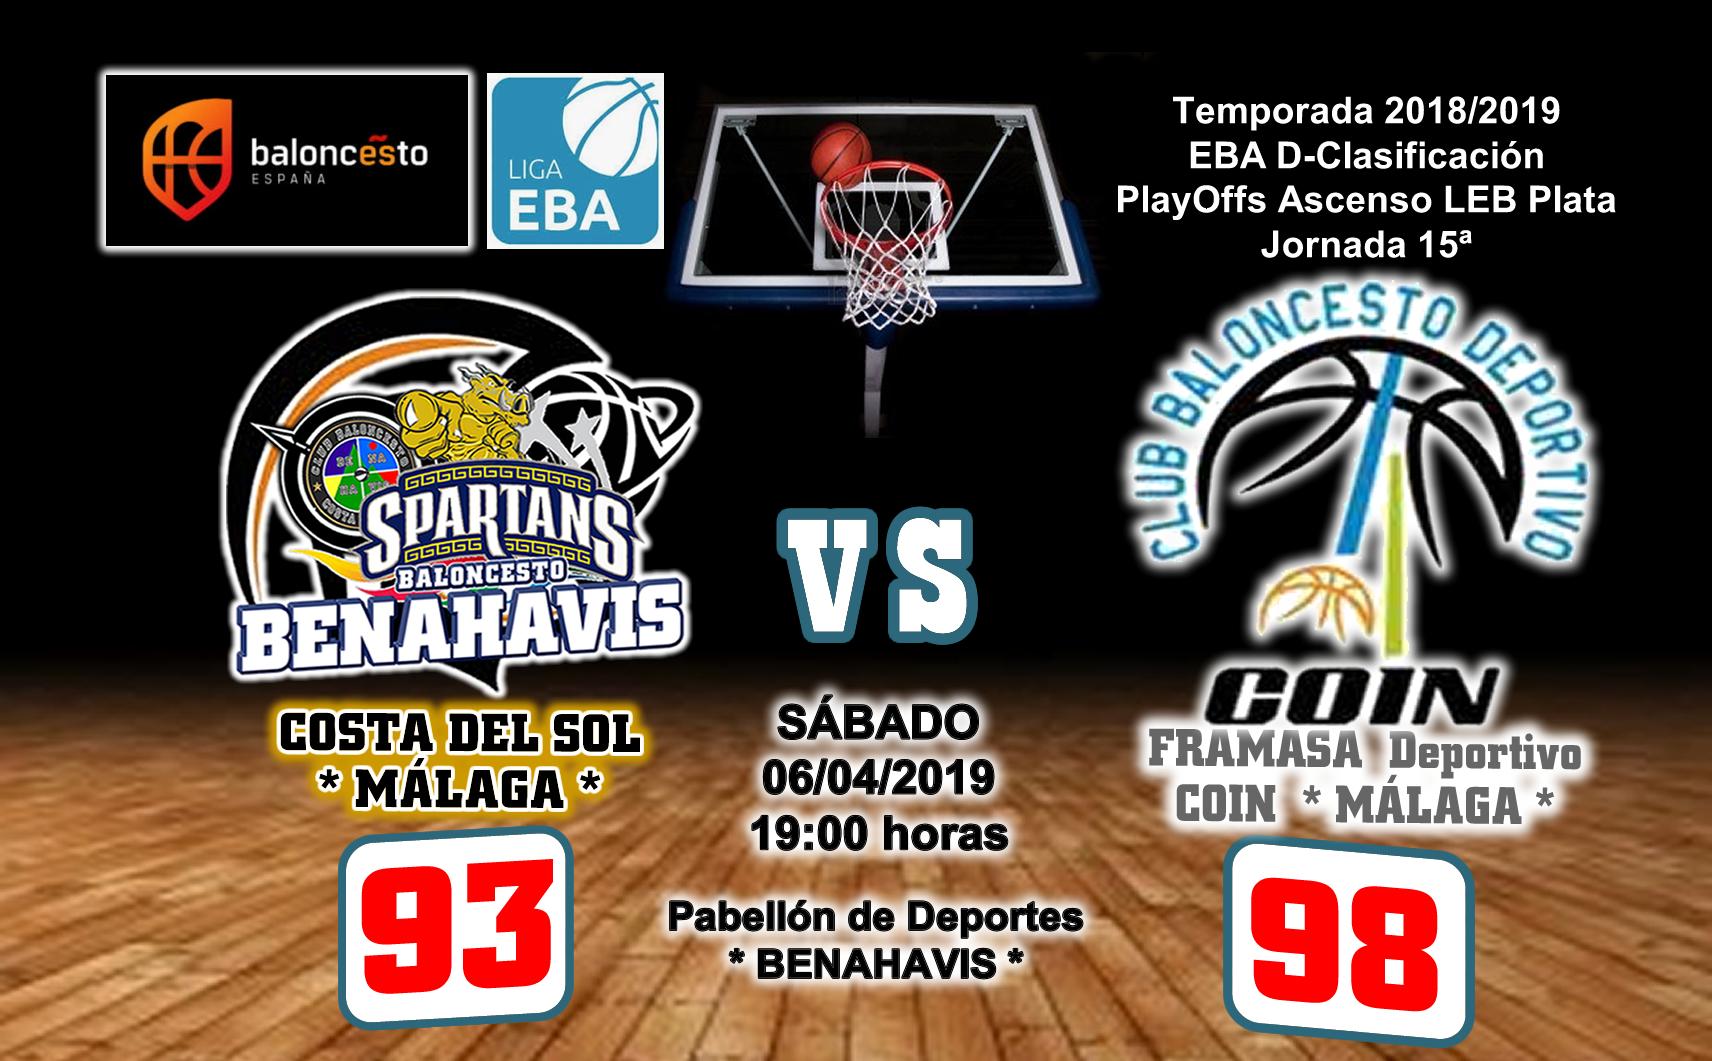 CRÓNICA EBA D 18/19> PlayOffs Ascenso Leb Plata   J-15ª > CB Benahavís Costa del Sol vs Framasa Deportivo Coín